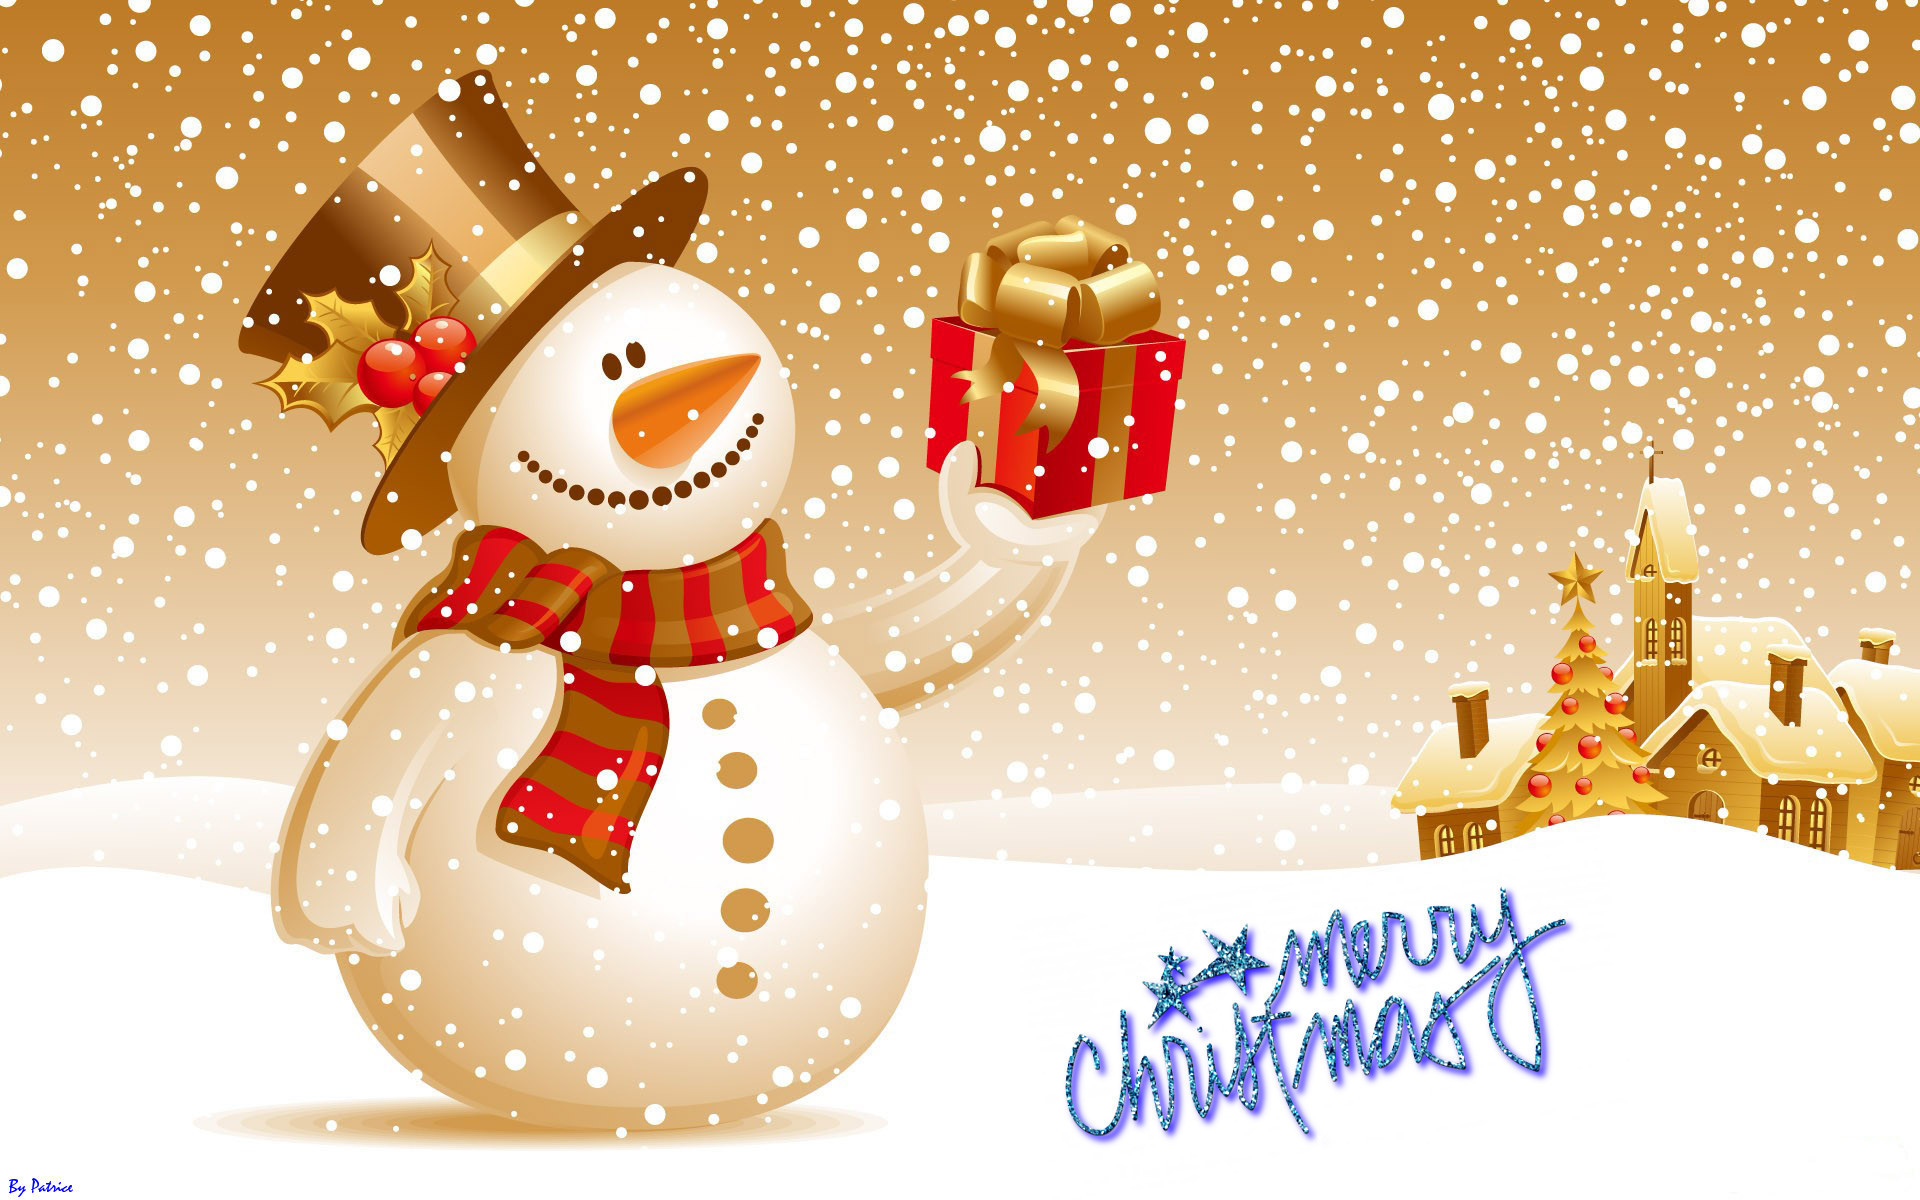 Merry Christmas Wallpaper Clip Art 43 Images